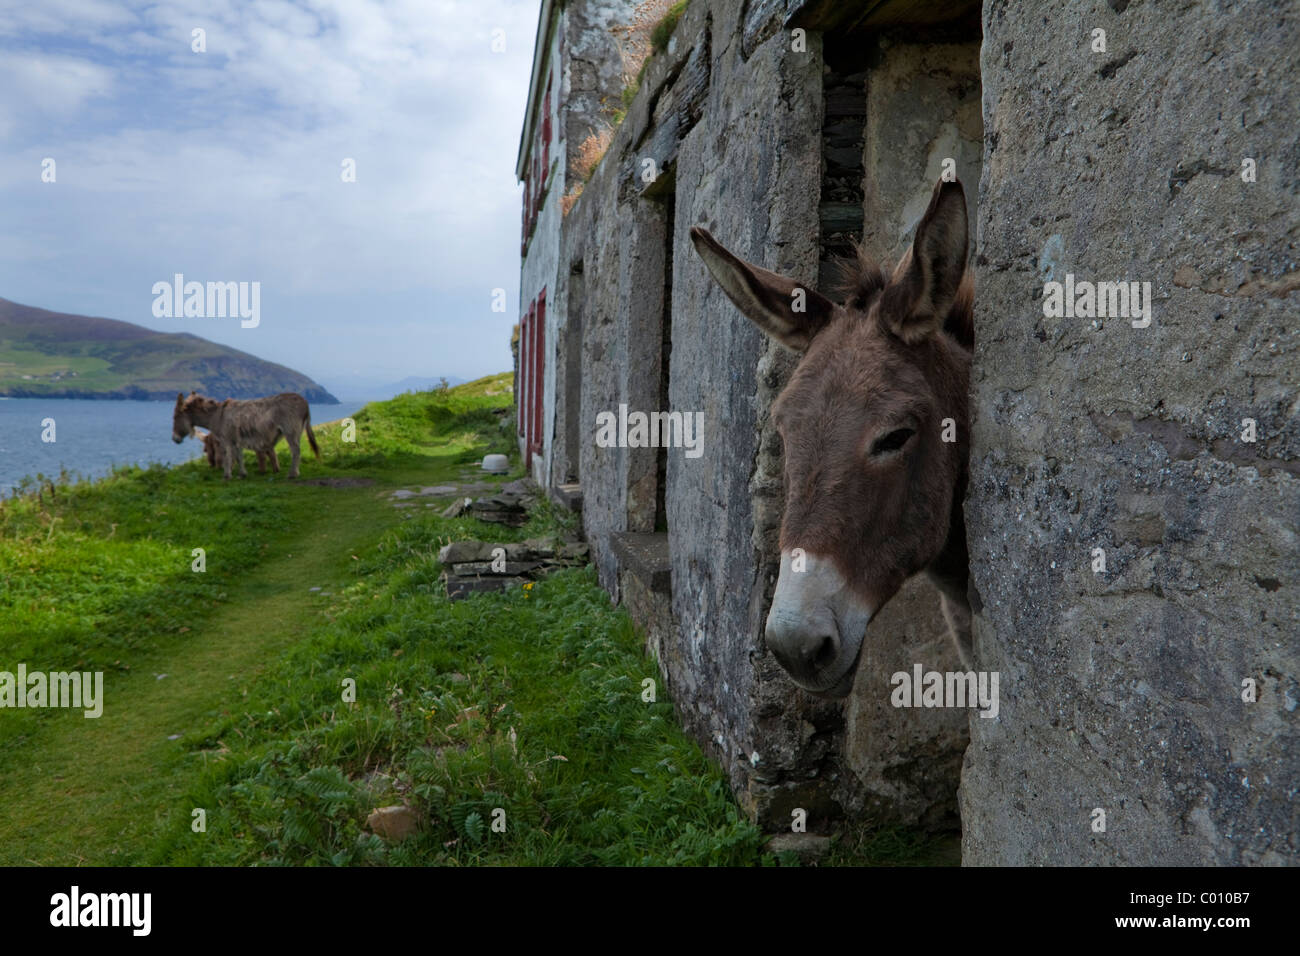 Donkeys in Evacuated Deserted Cottages on Great Blasket Island, The Blasket Islands, Off the Dingle Peninsula, County - Stock Image